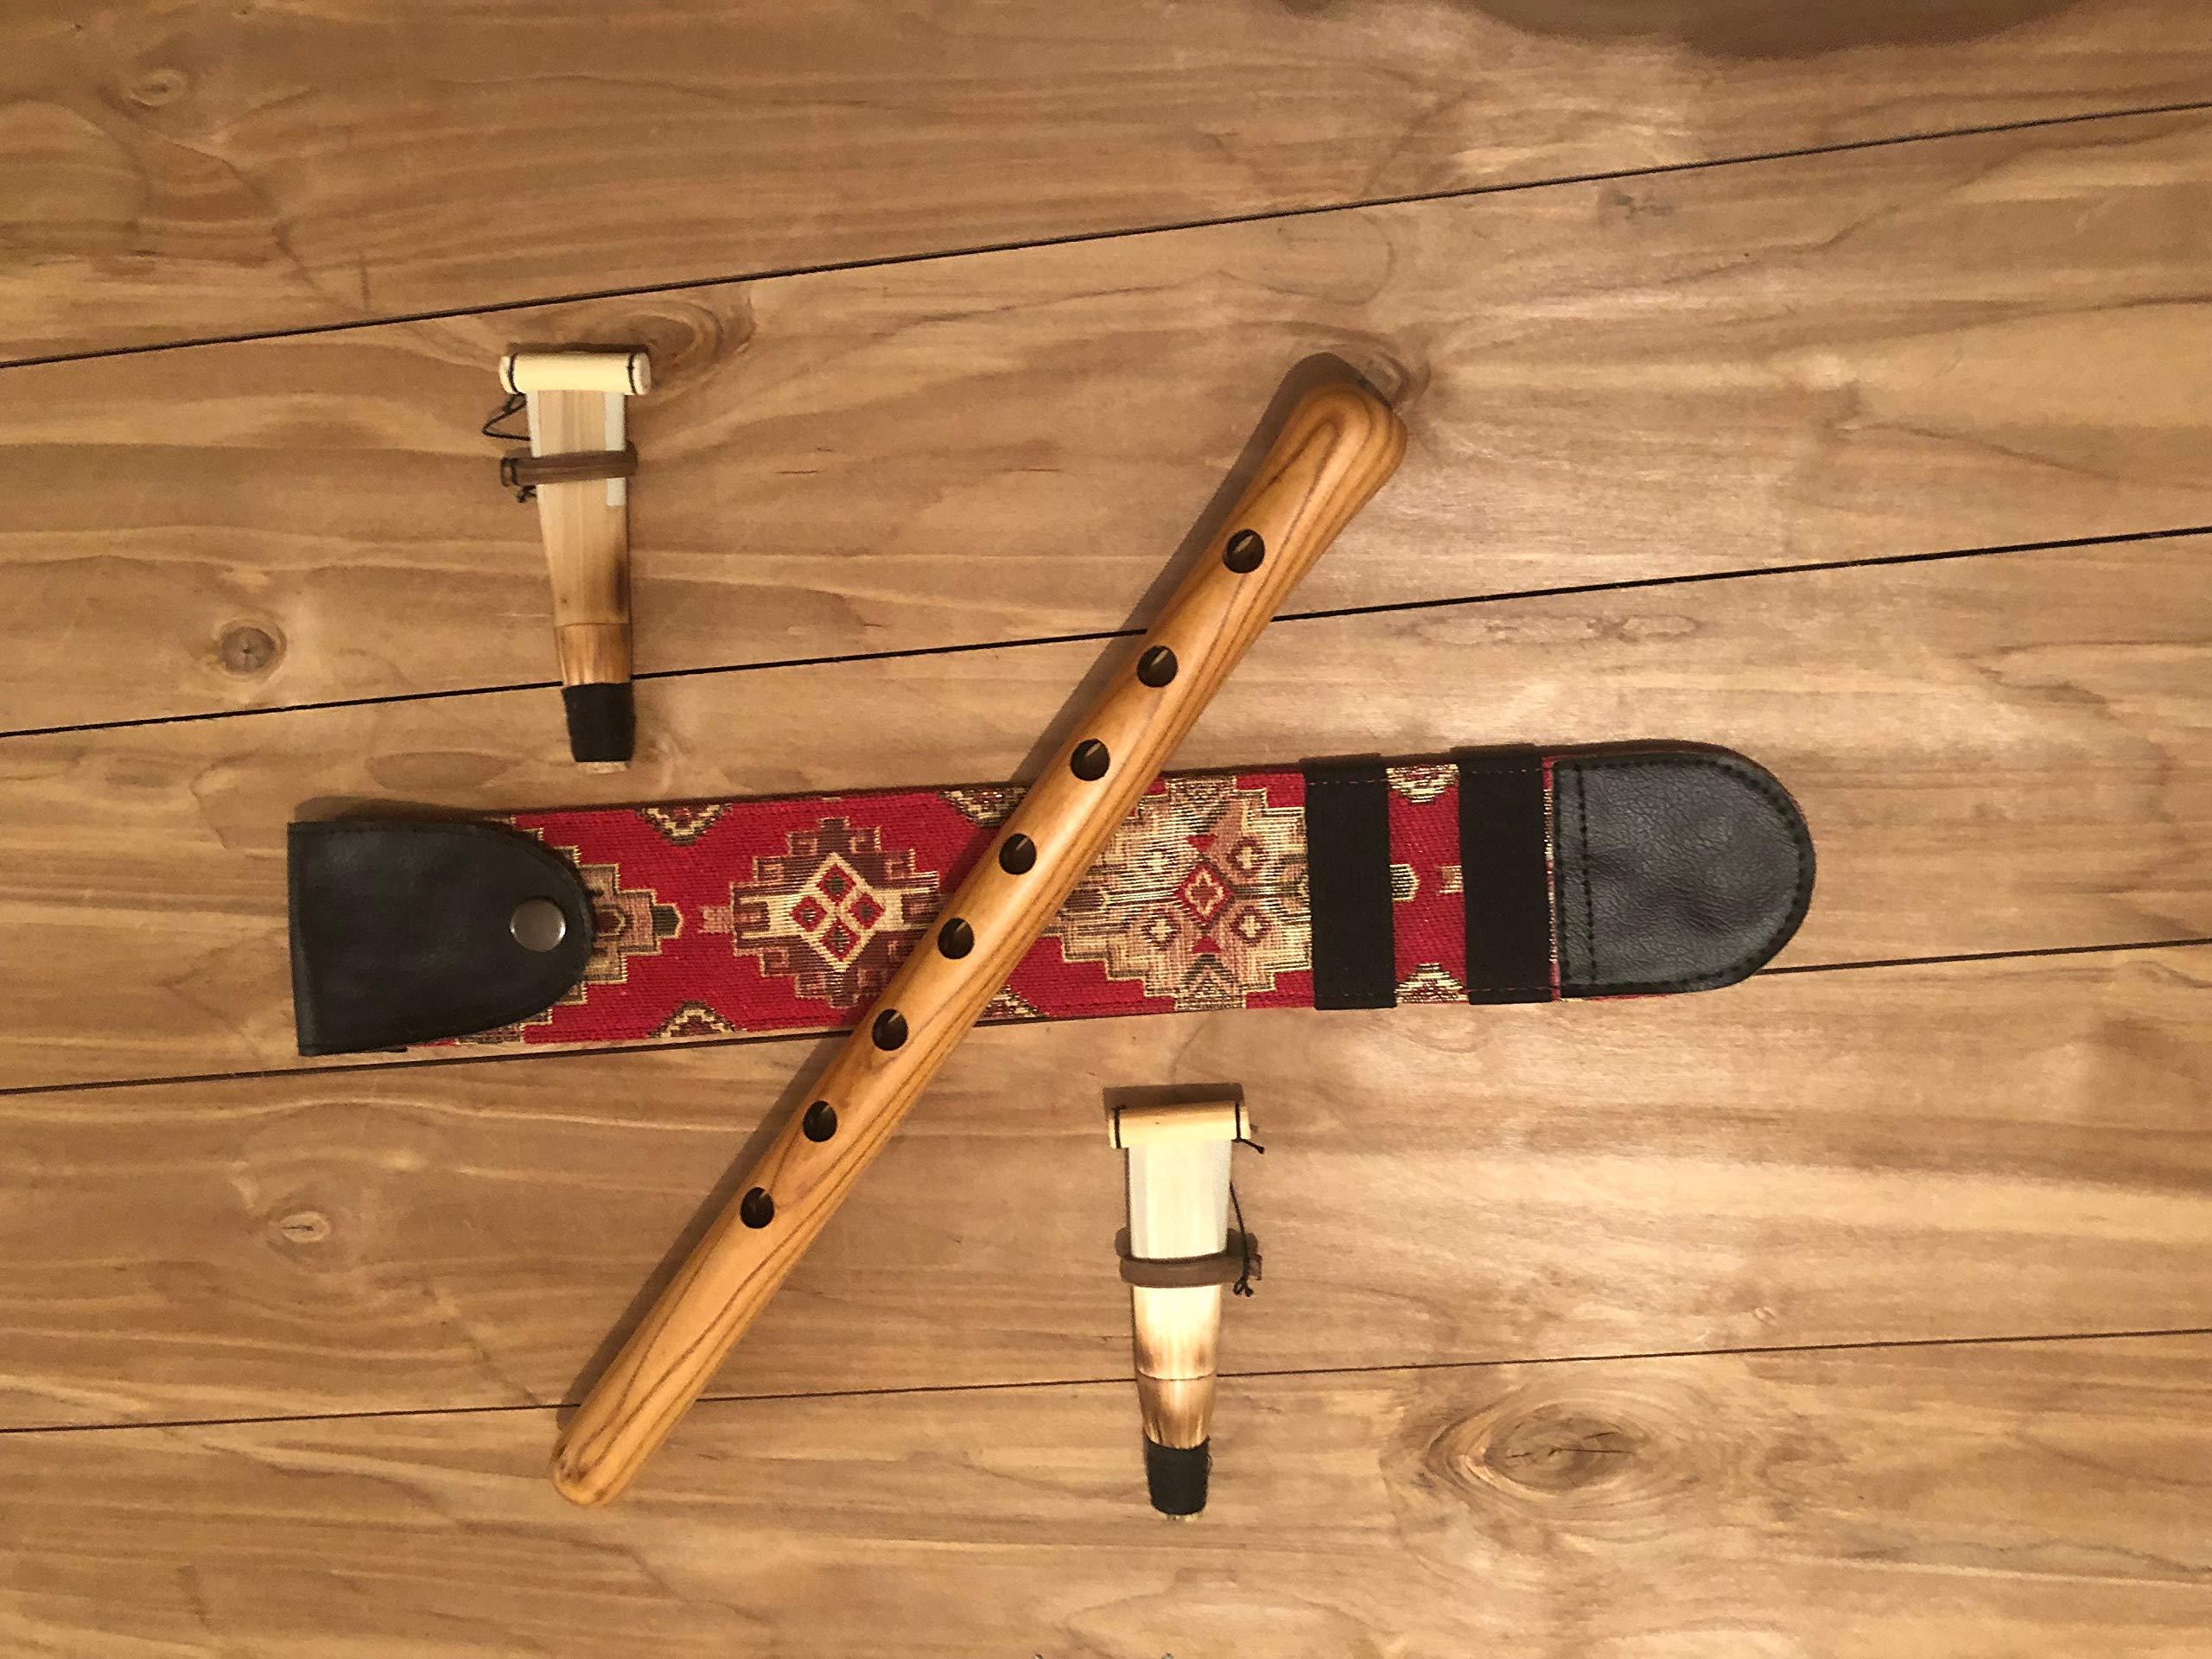 Armenian Professional Duduk, Professional Musical Instrument, Handmade from Armenian Apricot Wood, Armenian Classical Music and Art Made in Armenia Musical